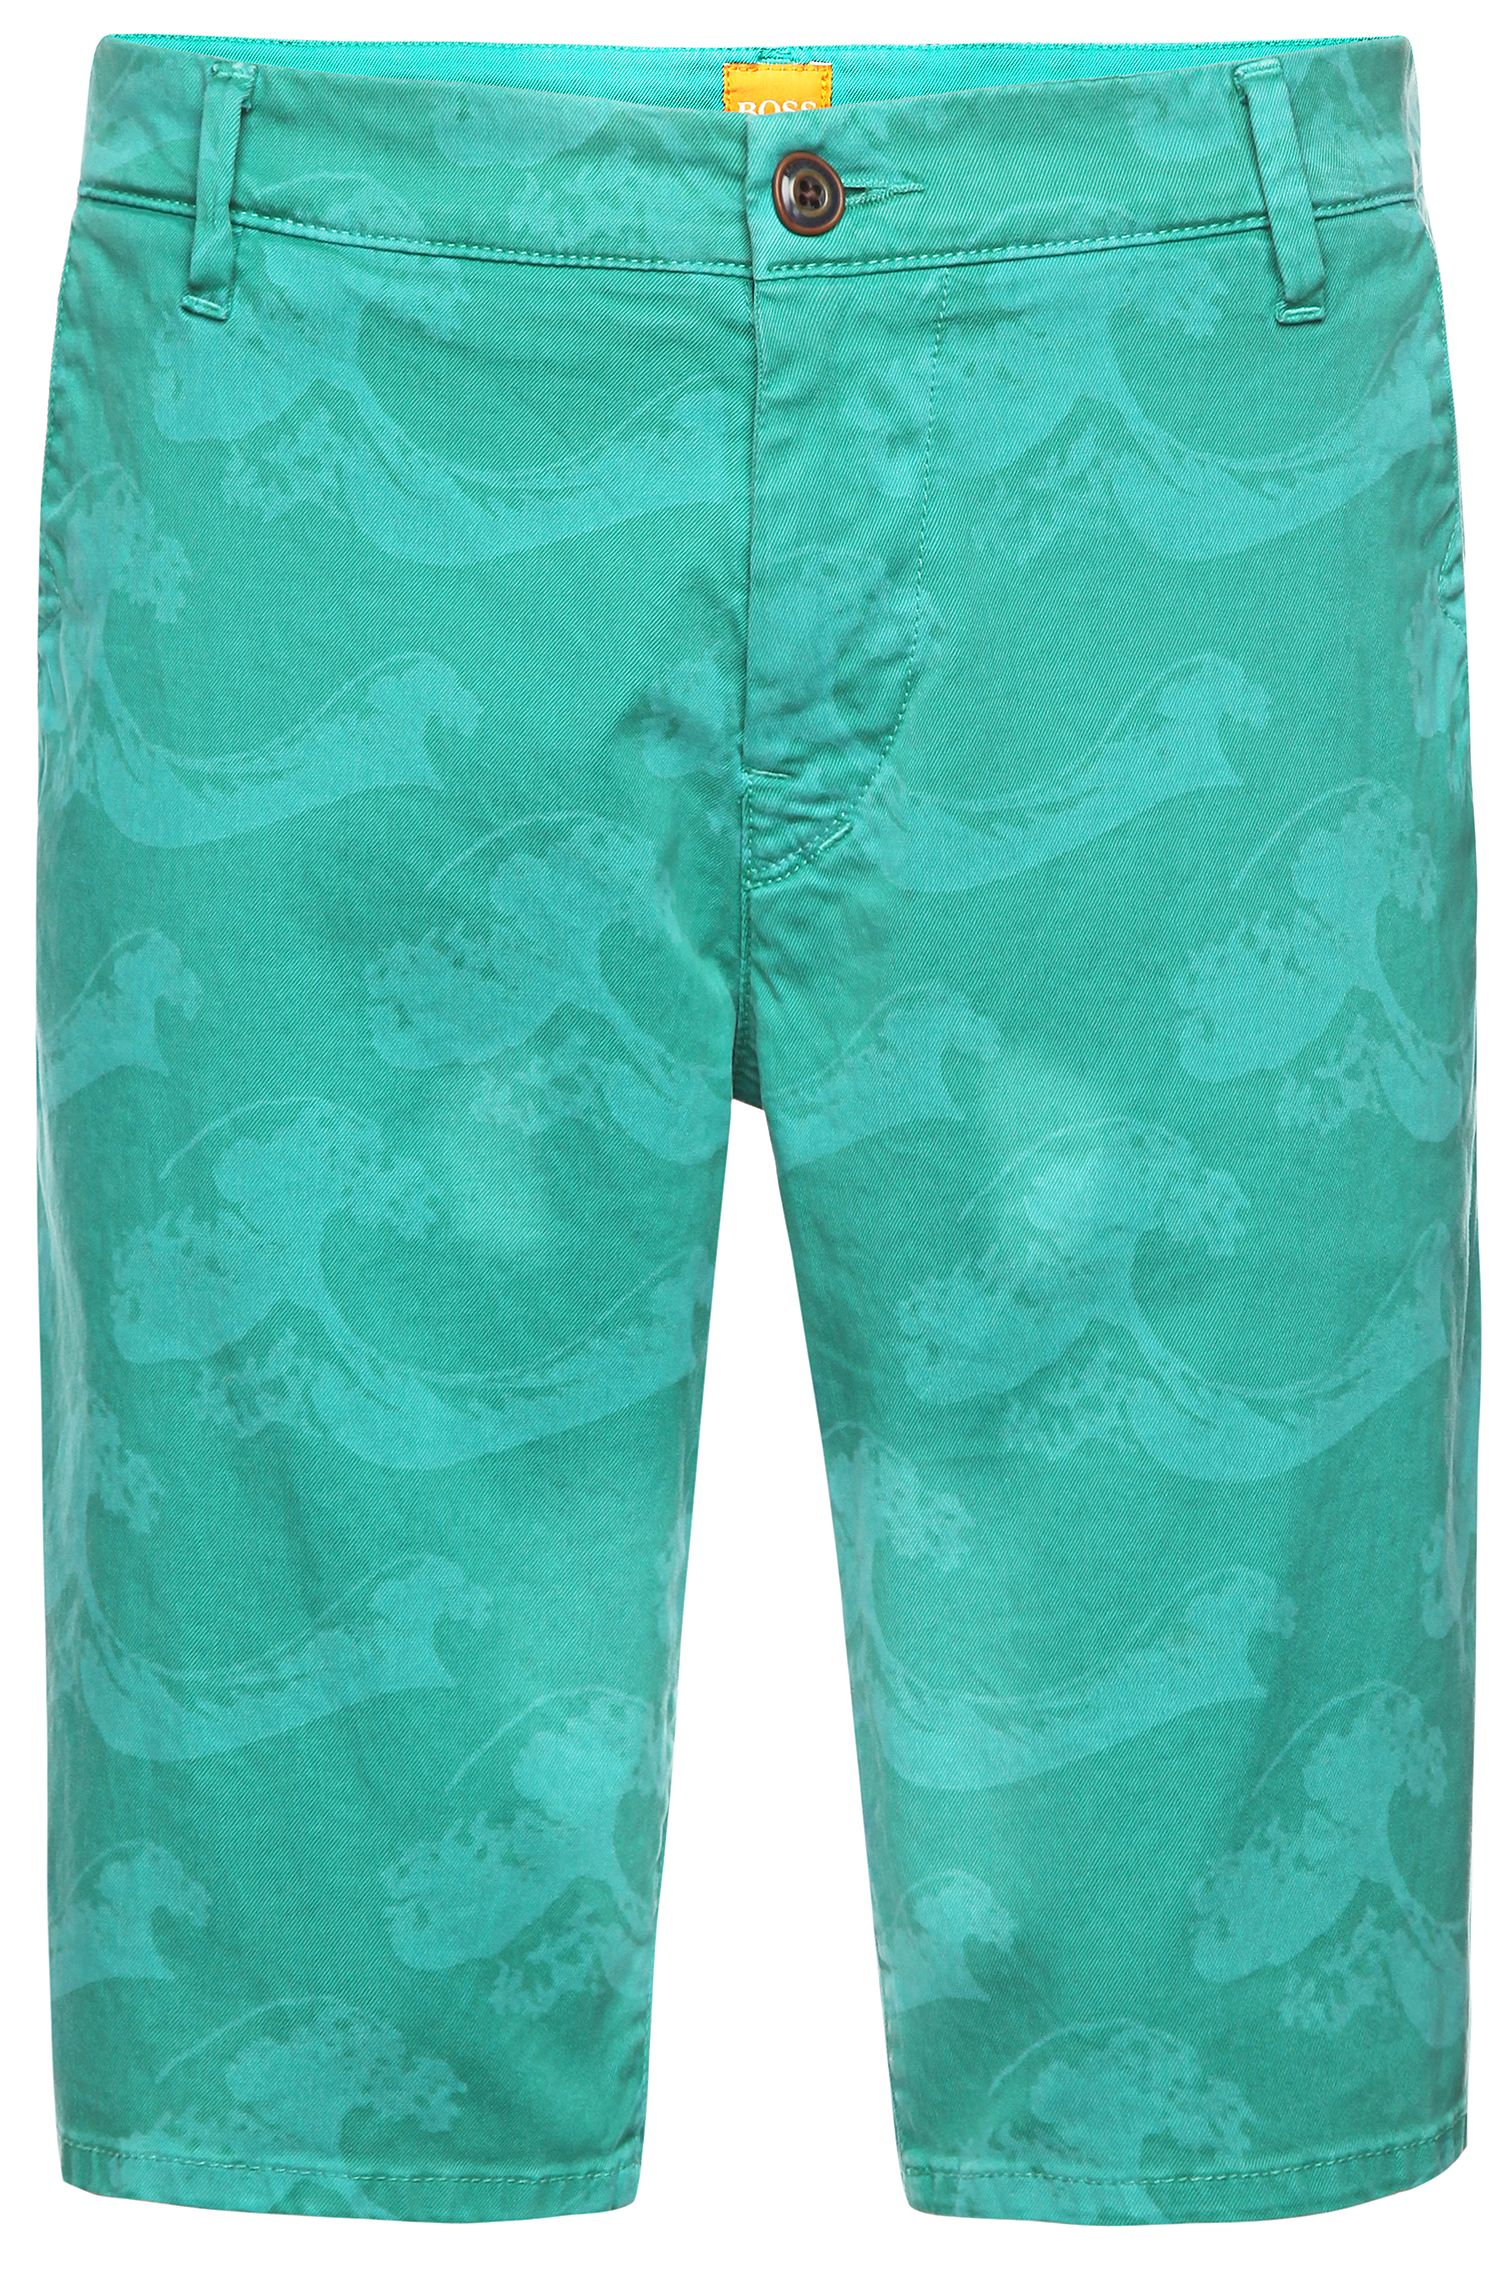 Slim-Fit Bermuda-Shorts aus Baumwoll-Mix: ´Sairy8-Shorts-D`